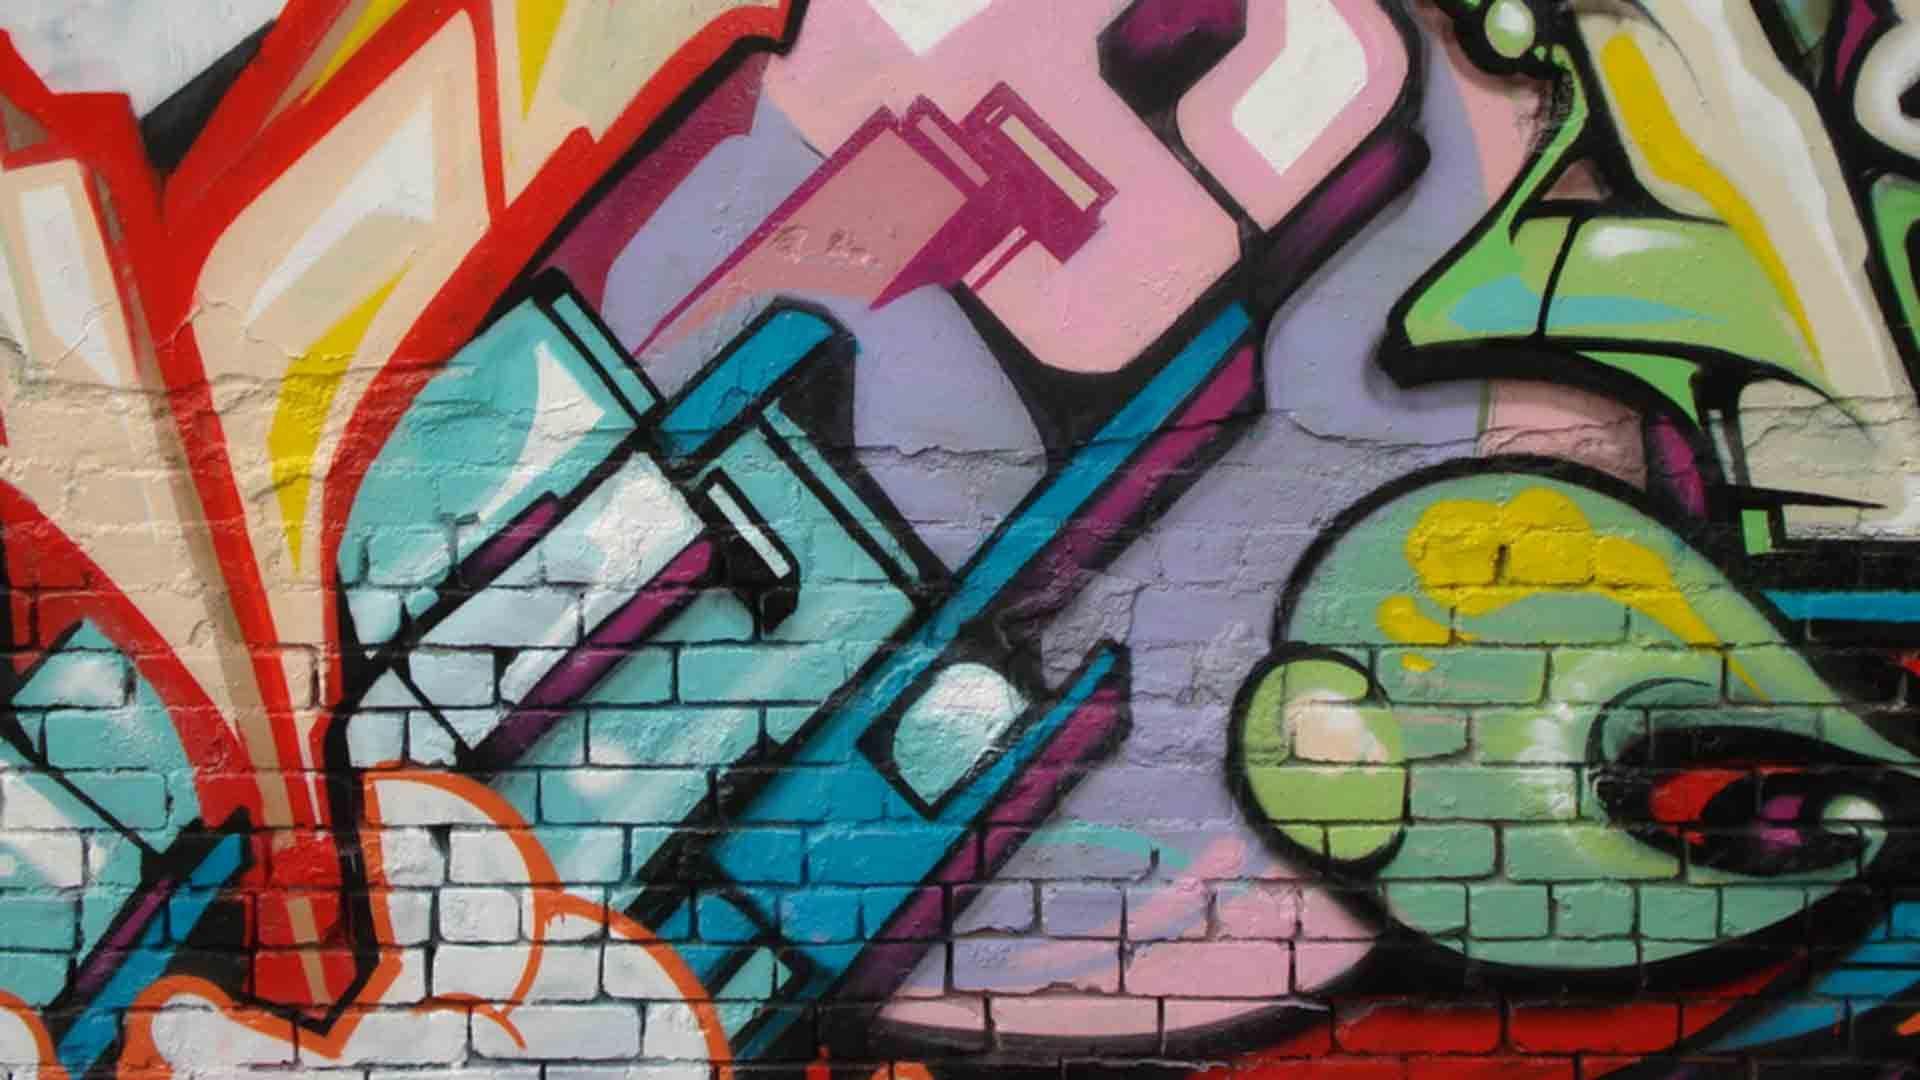 Graffiti Art Wallpapers For Iphone